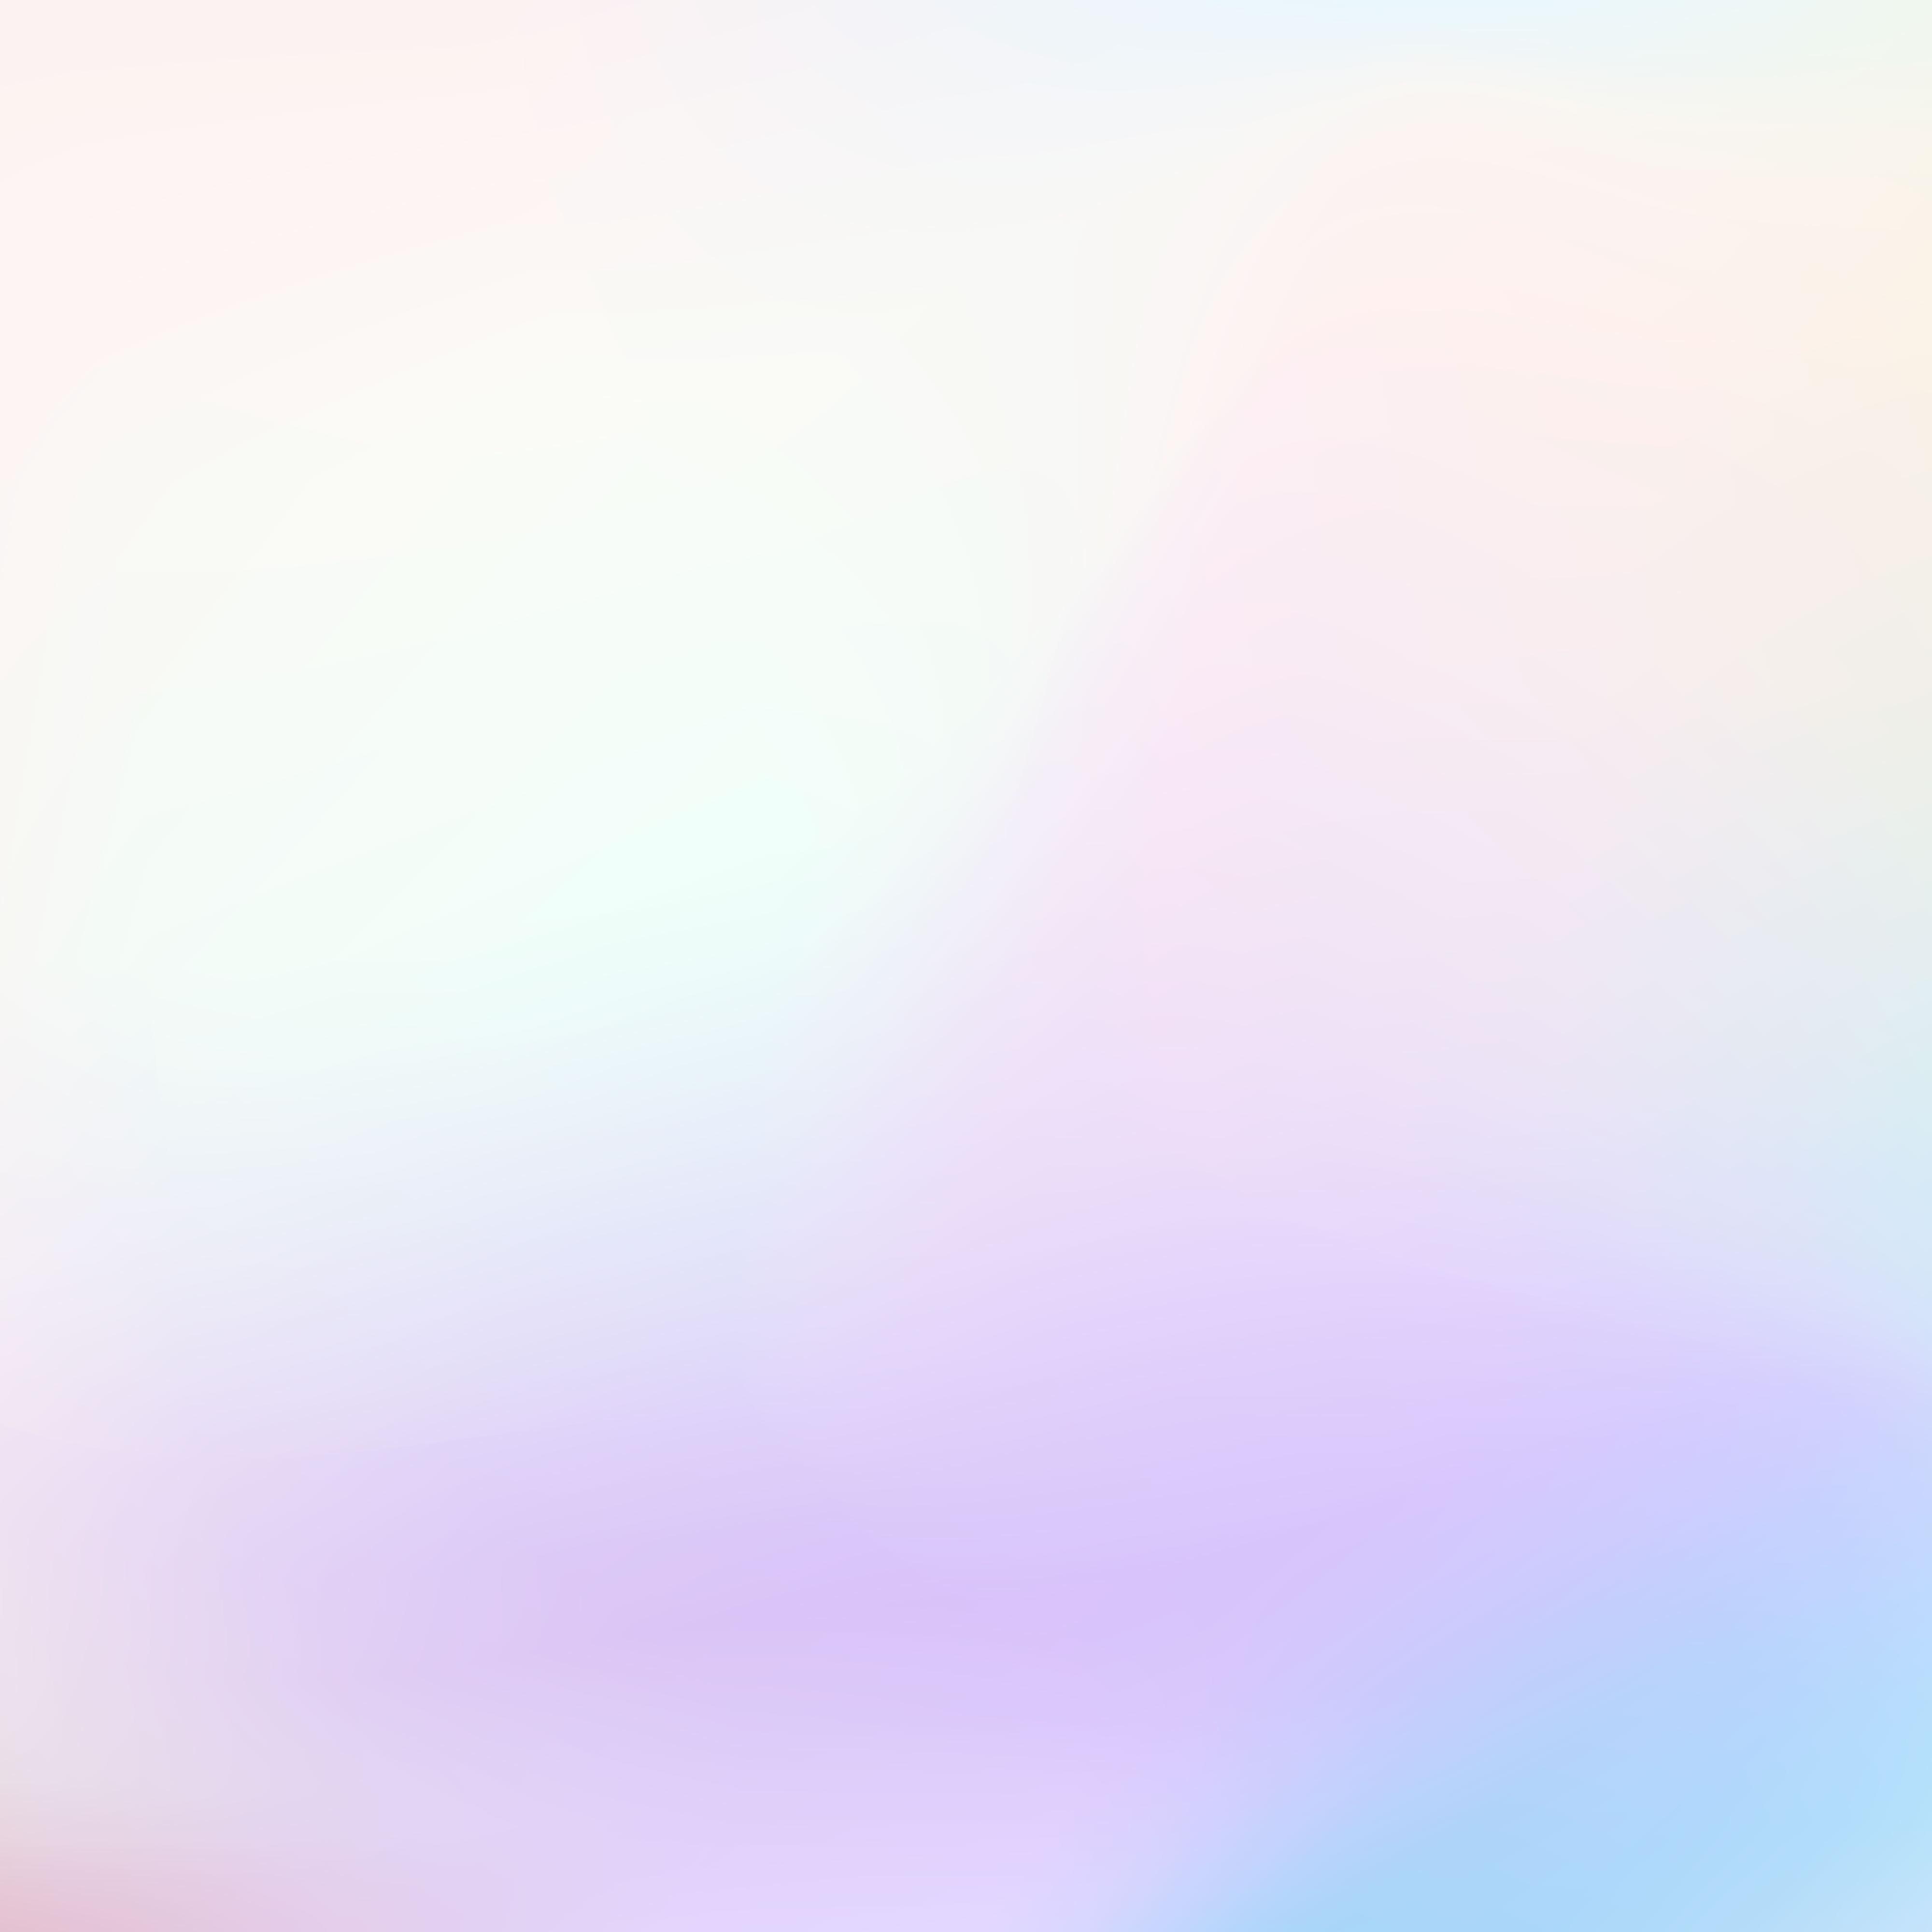 Mazette gradiant